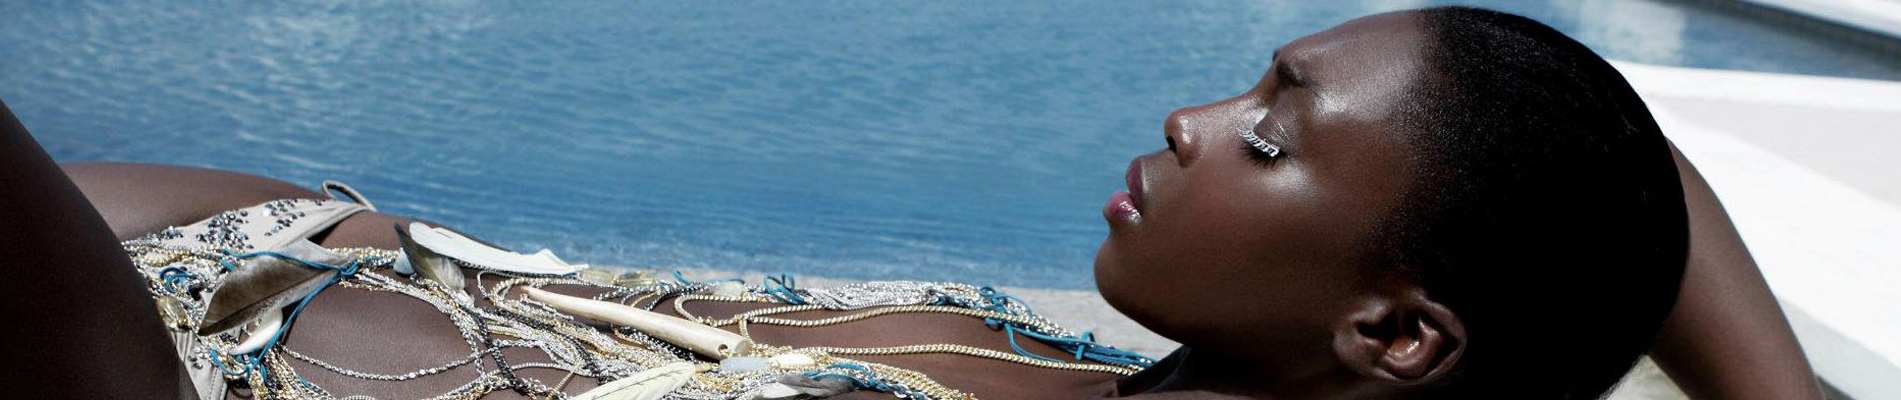 Adha Zelma Jewelry Header